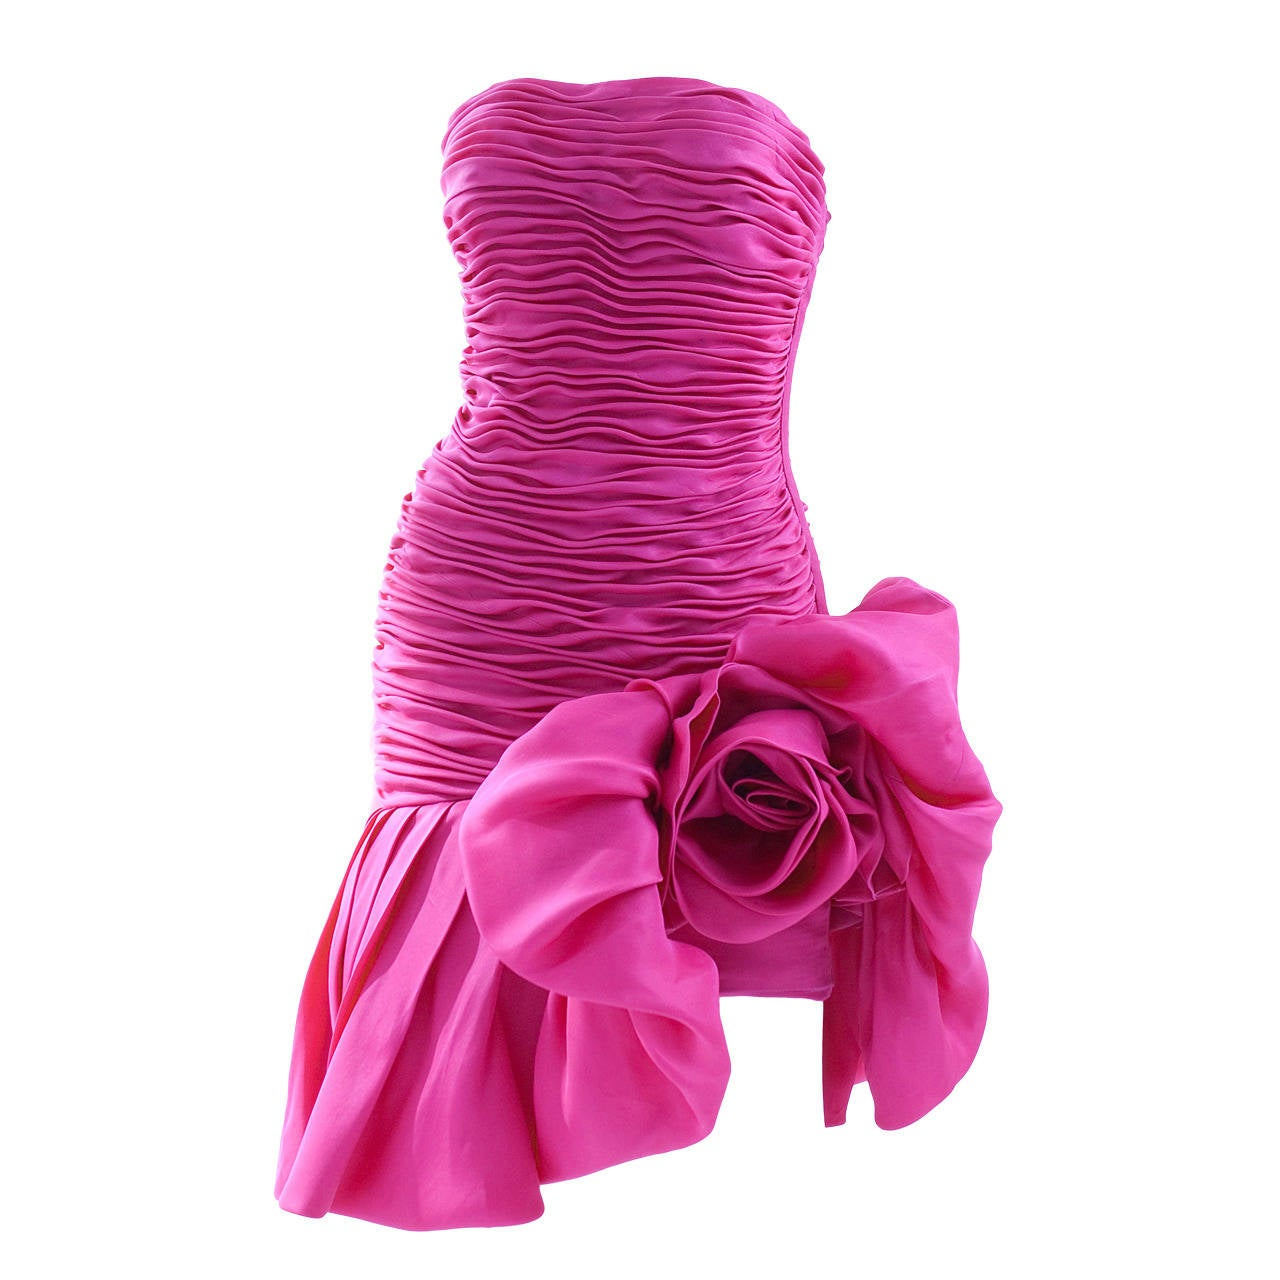 Emanuel Ungaro Parallele Paris Cocktail Dress 1